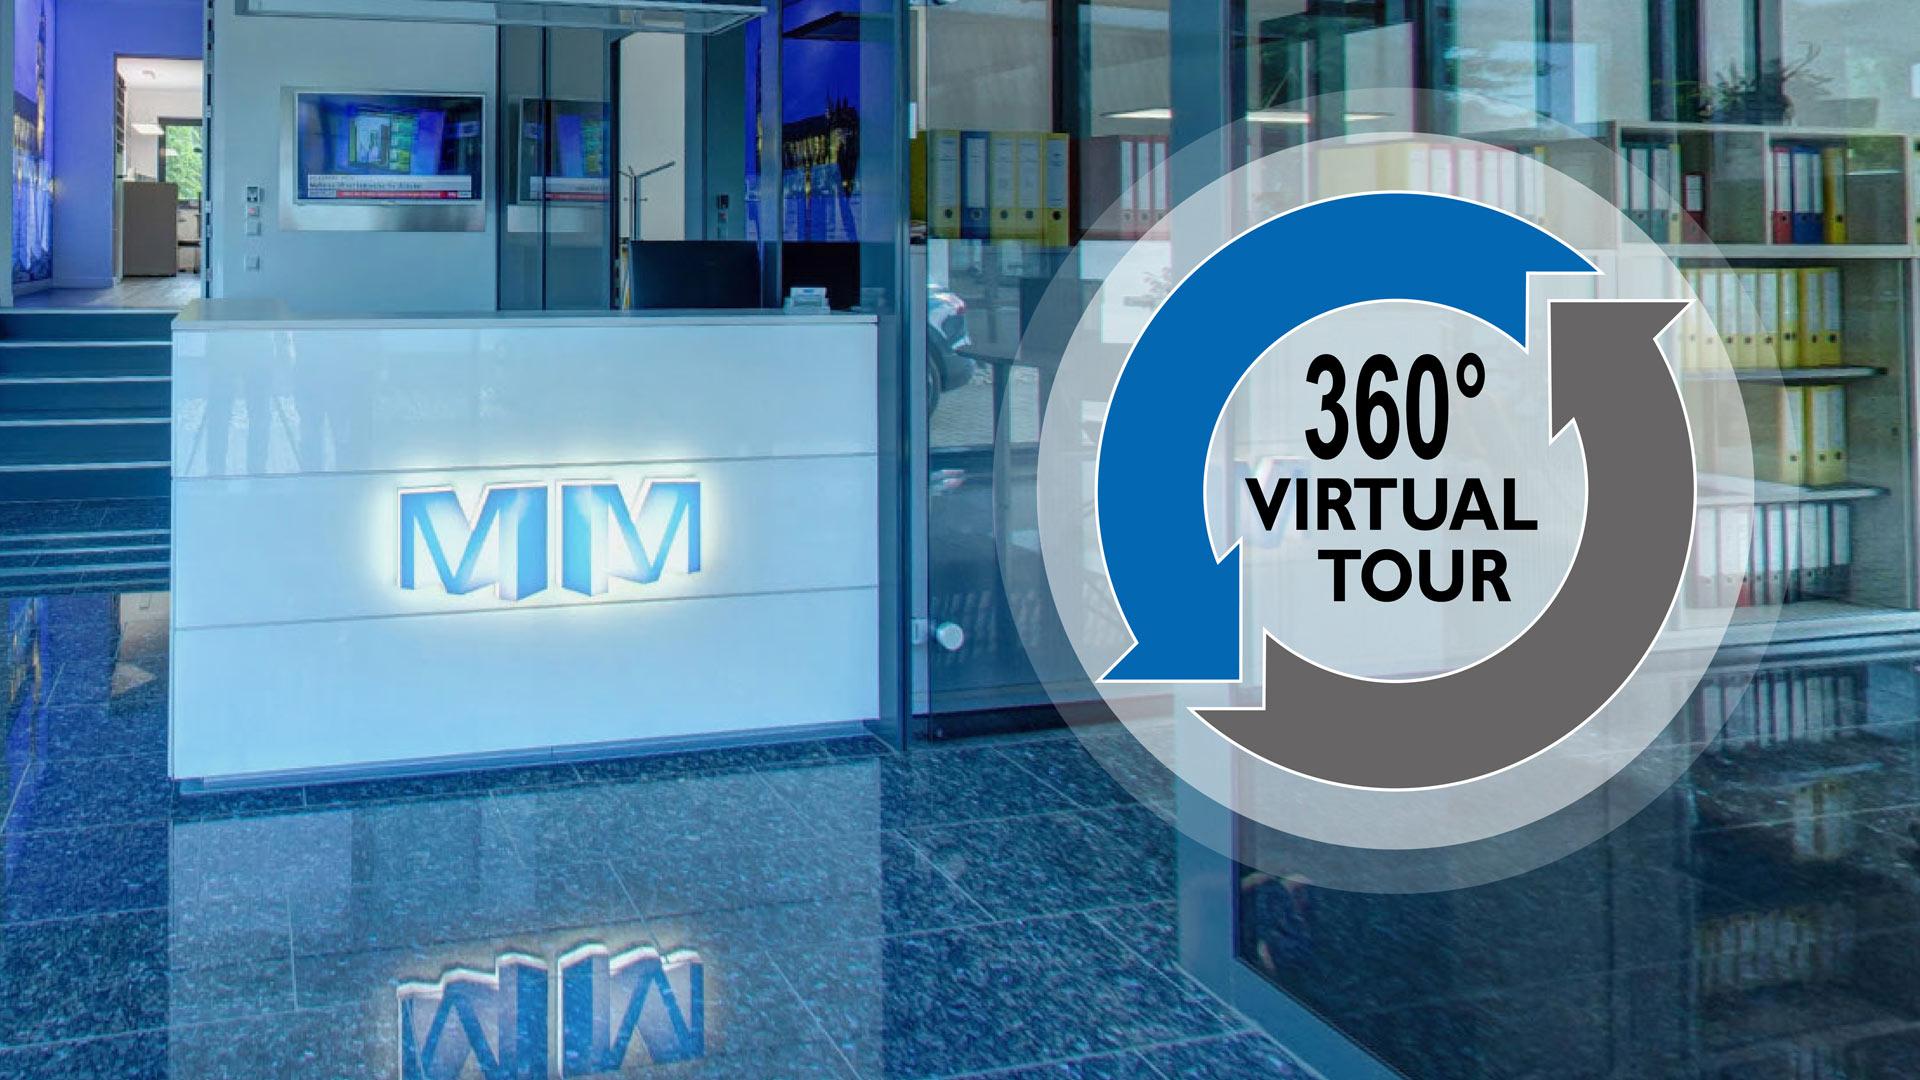 Metallbau Medoch GmbH in Magdeburg - 360 Grad Virtual Tour 2